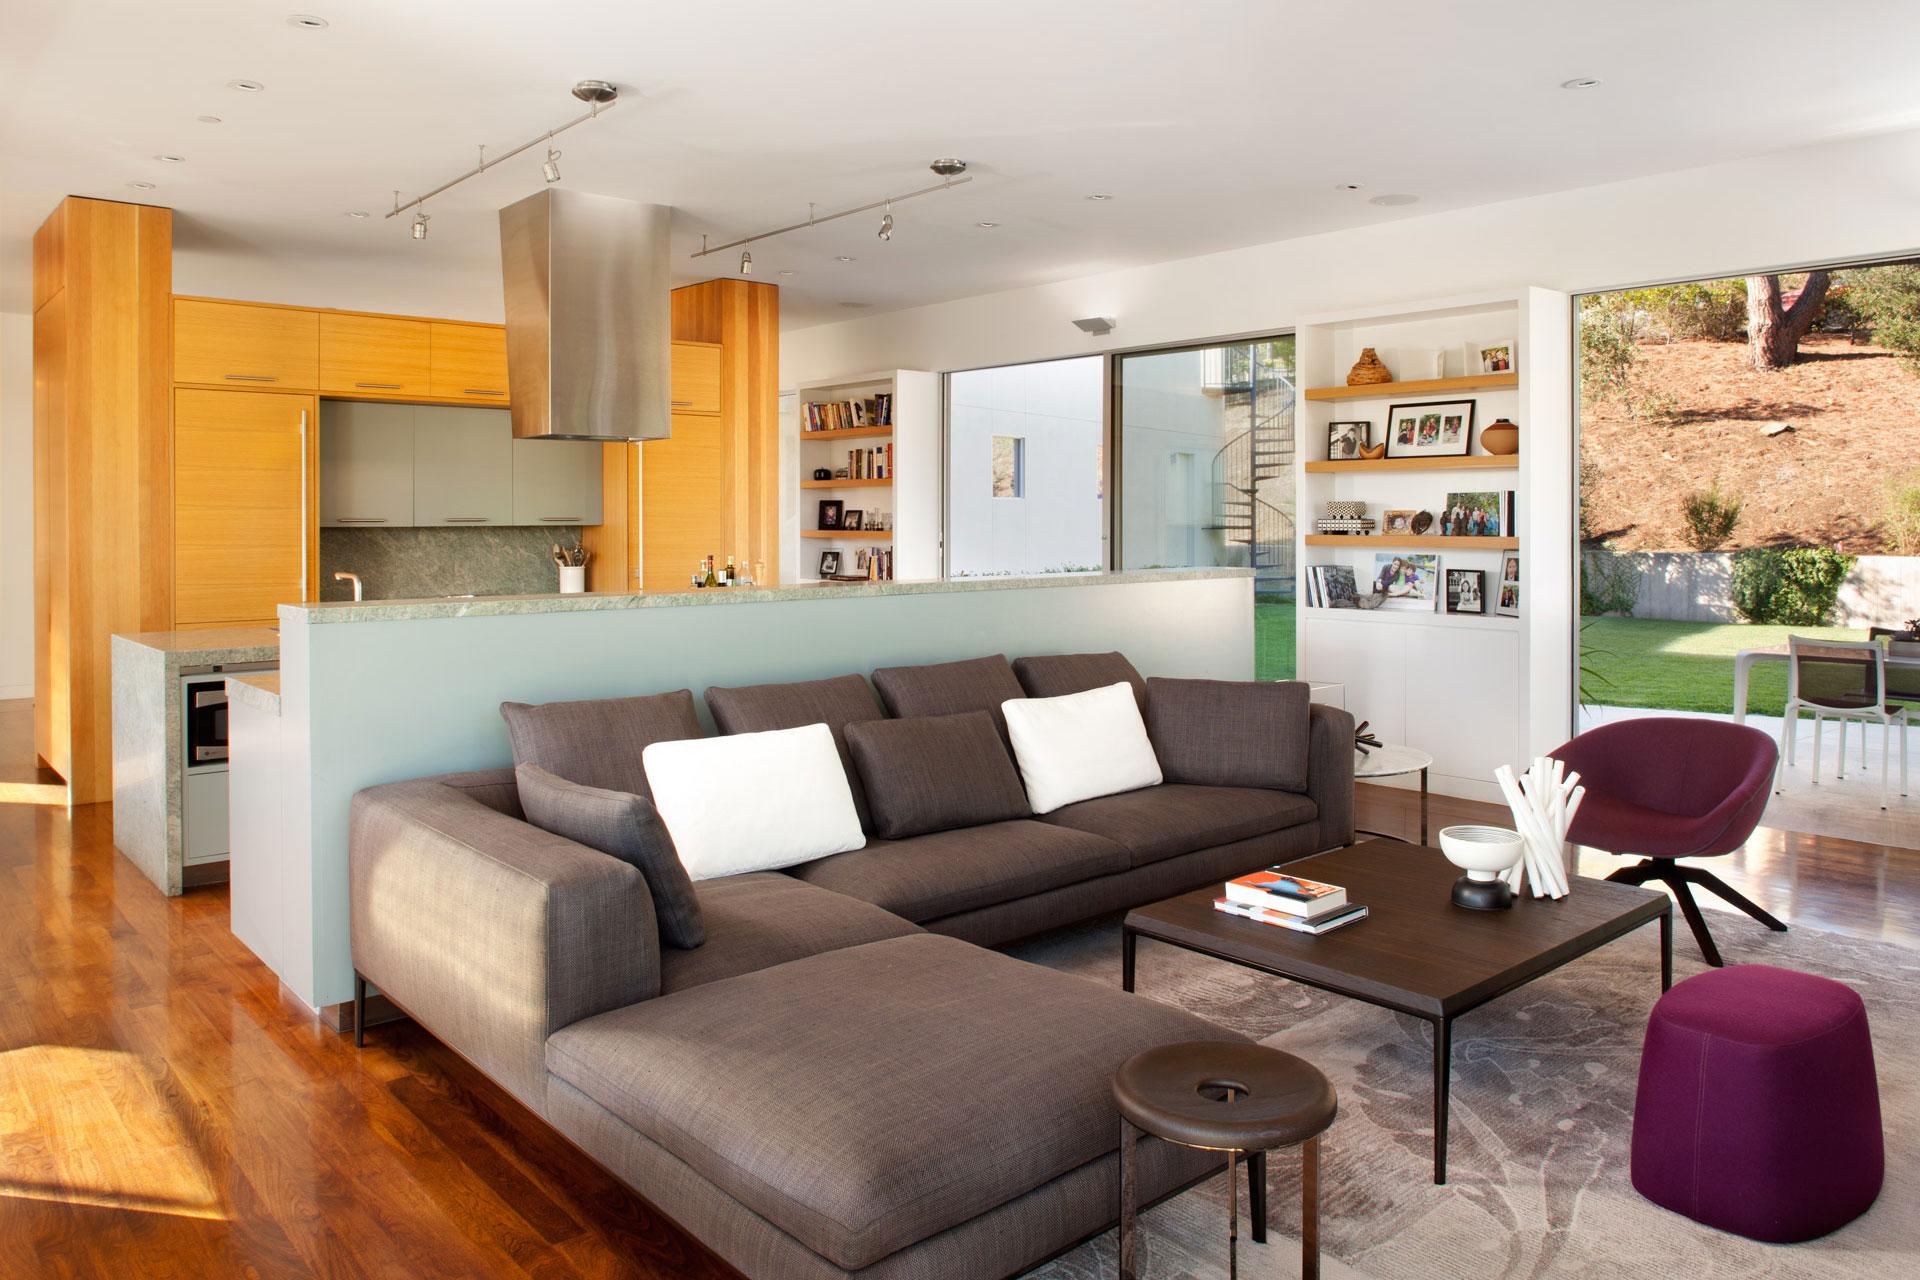 Los Altos Hills Residence apartment design